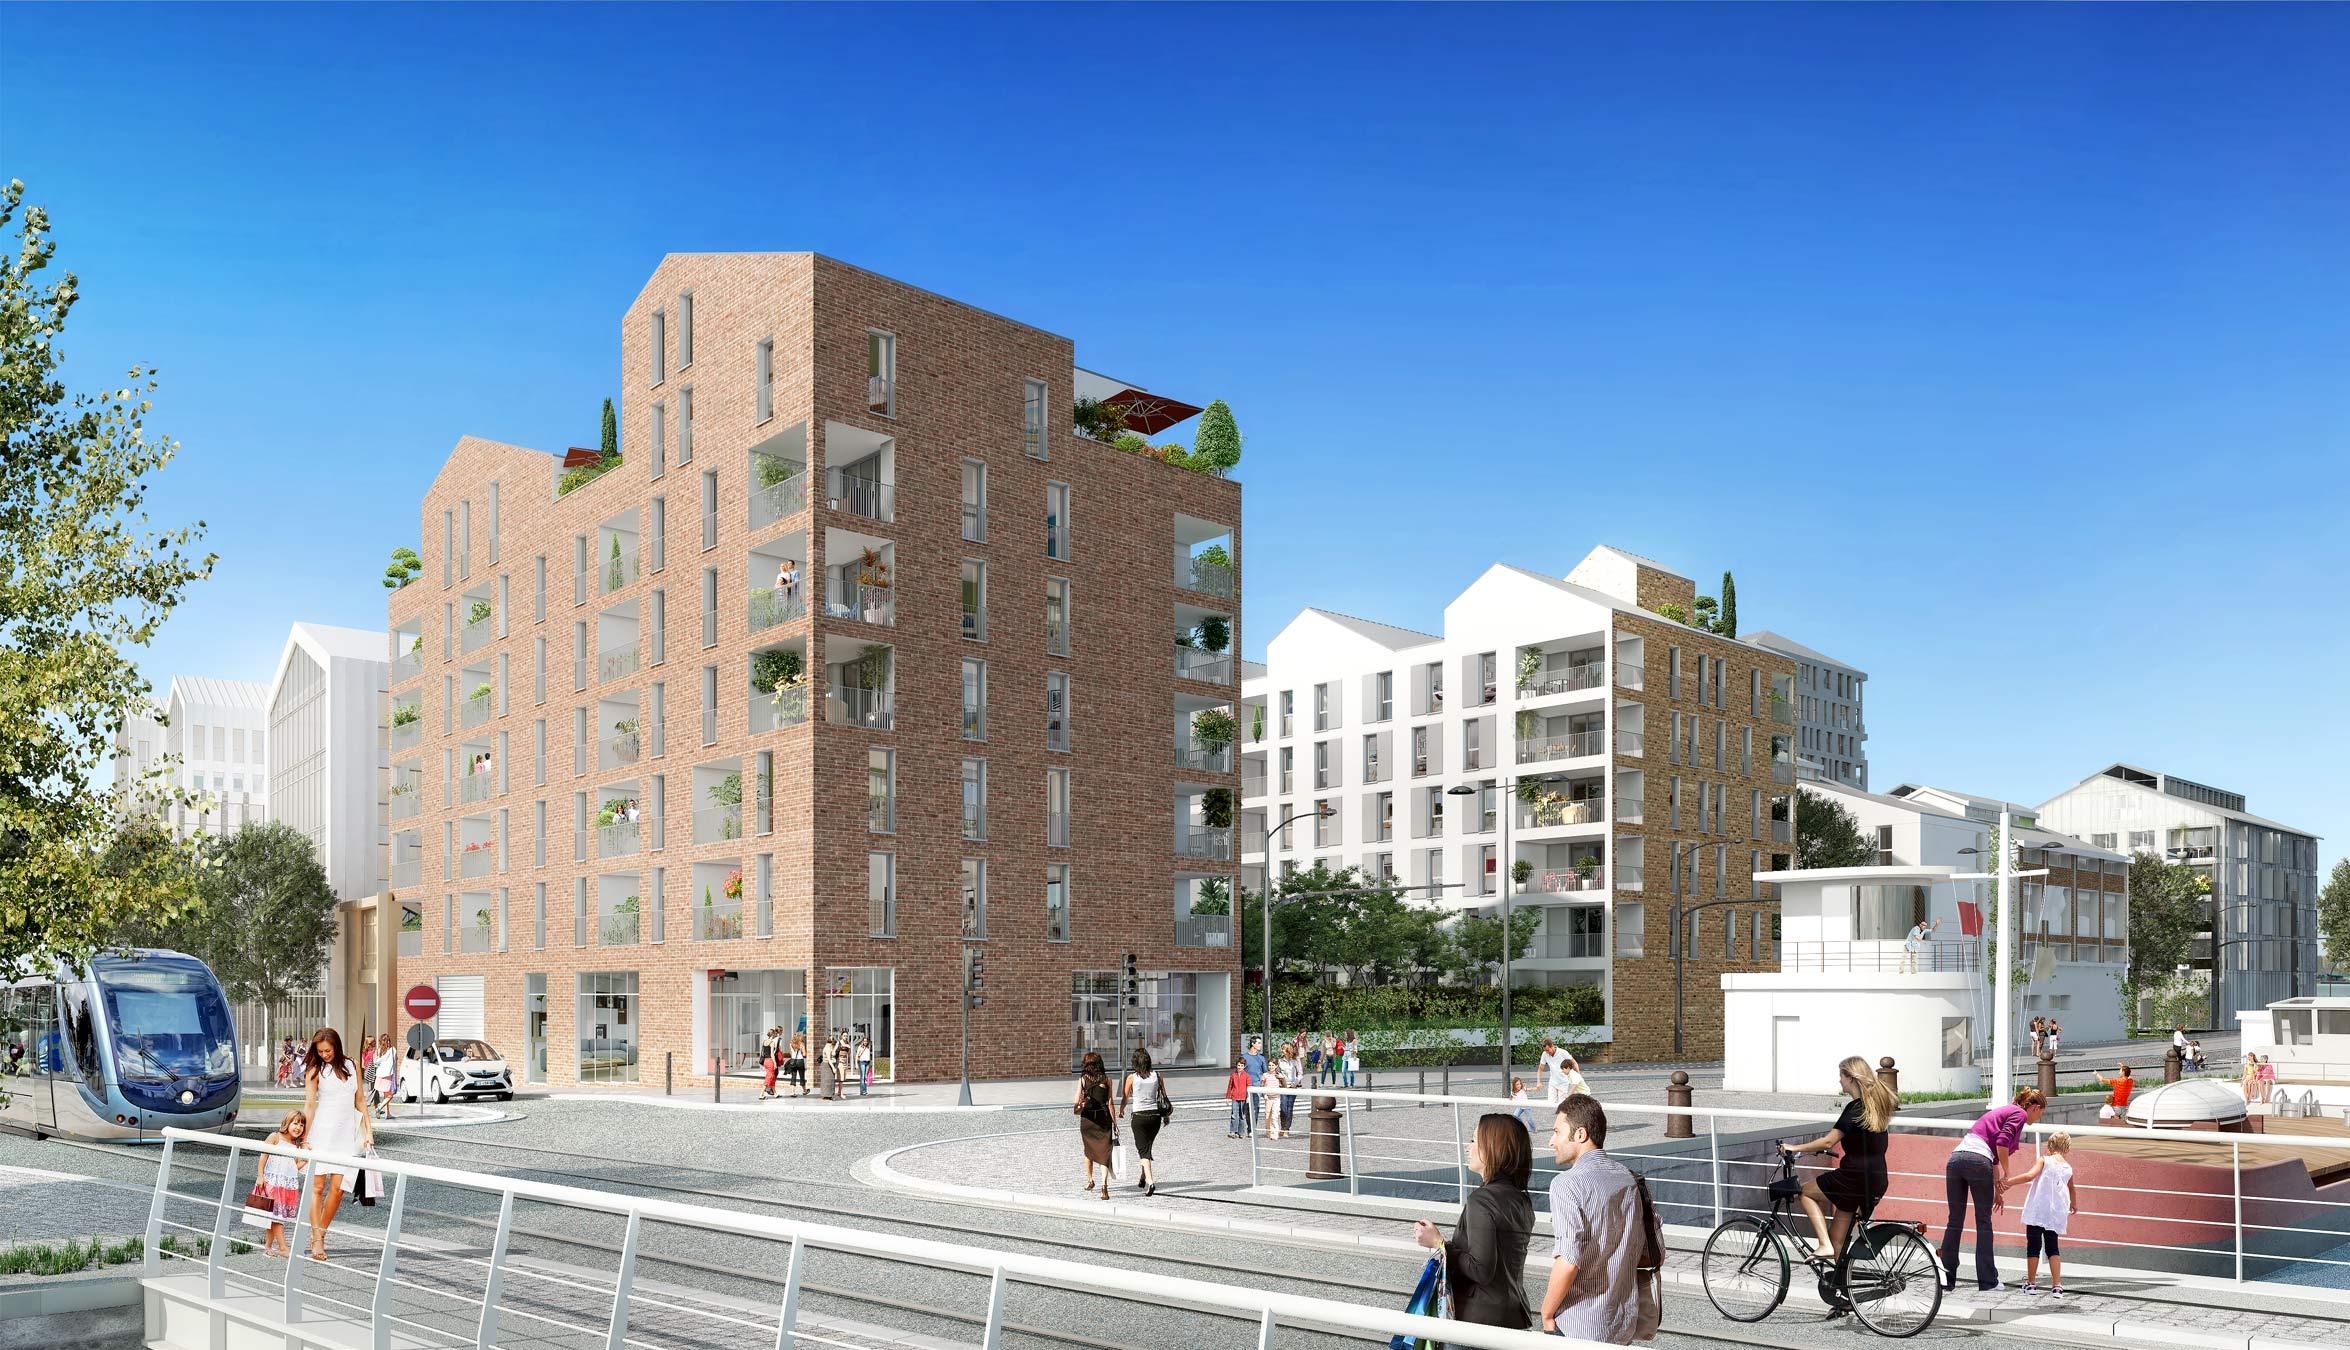 R sidence de grand standing dot e d une architecture - Architecture contemporaine residence parks ...